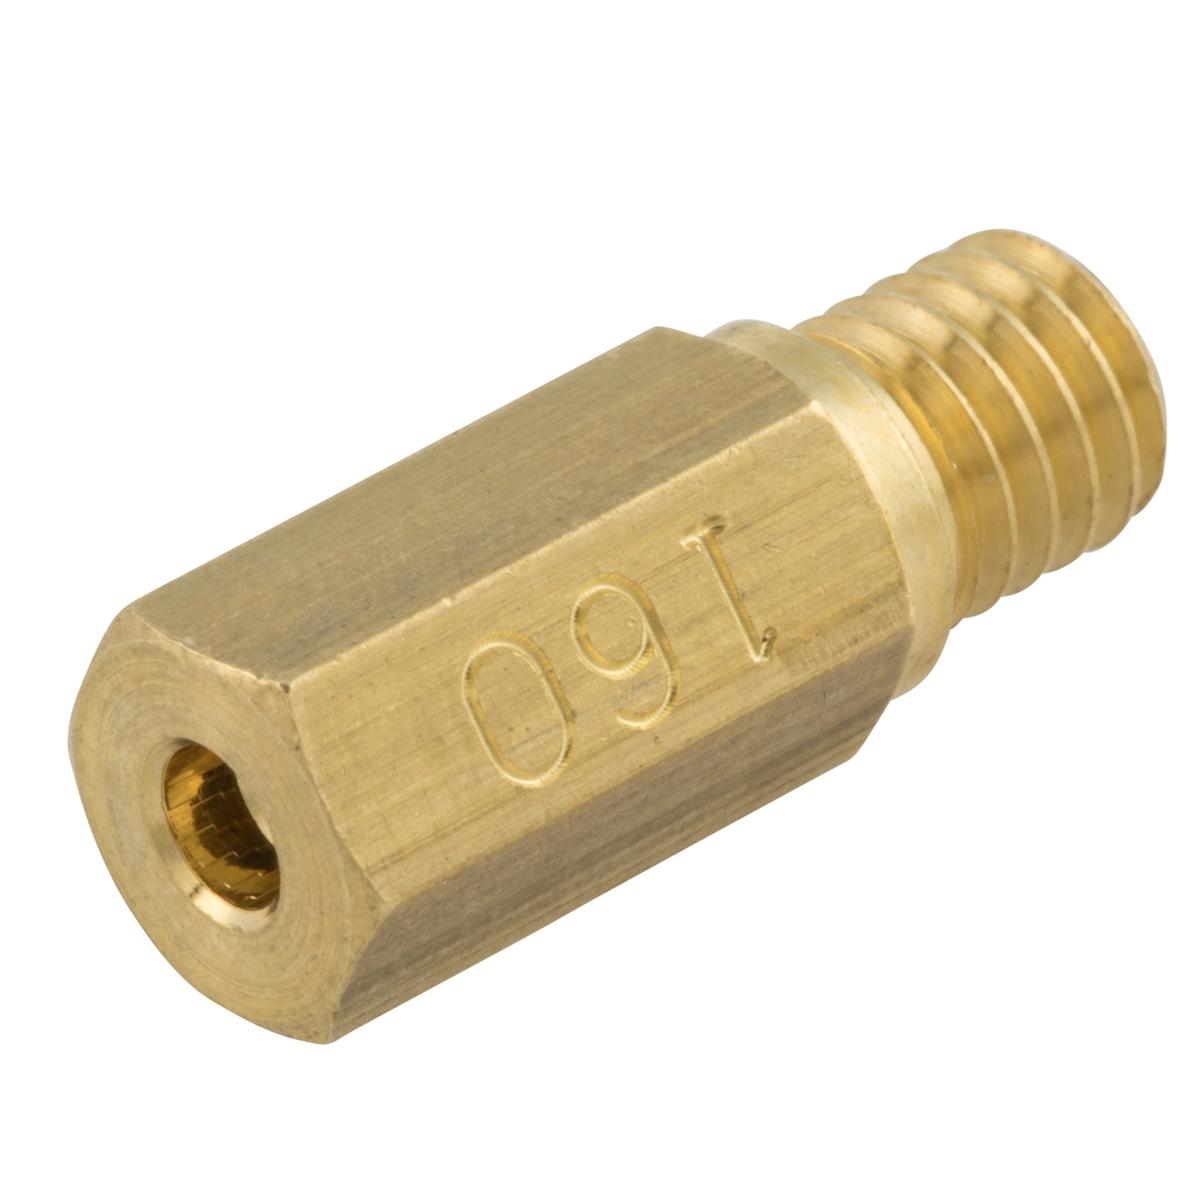 Produktbild für 'Düse KMT 152 Ø 6 mm'